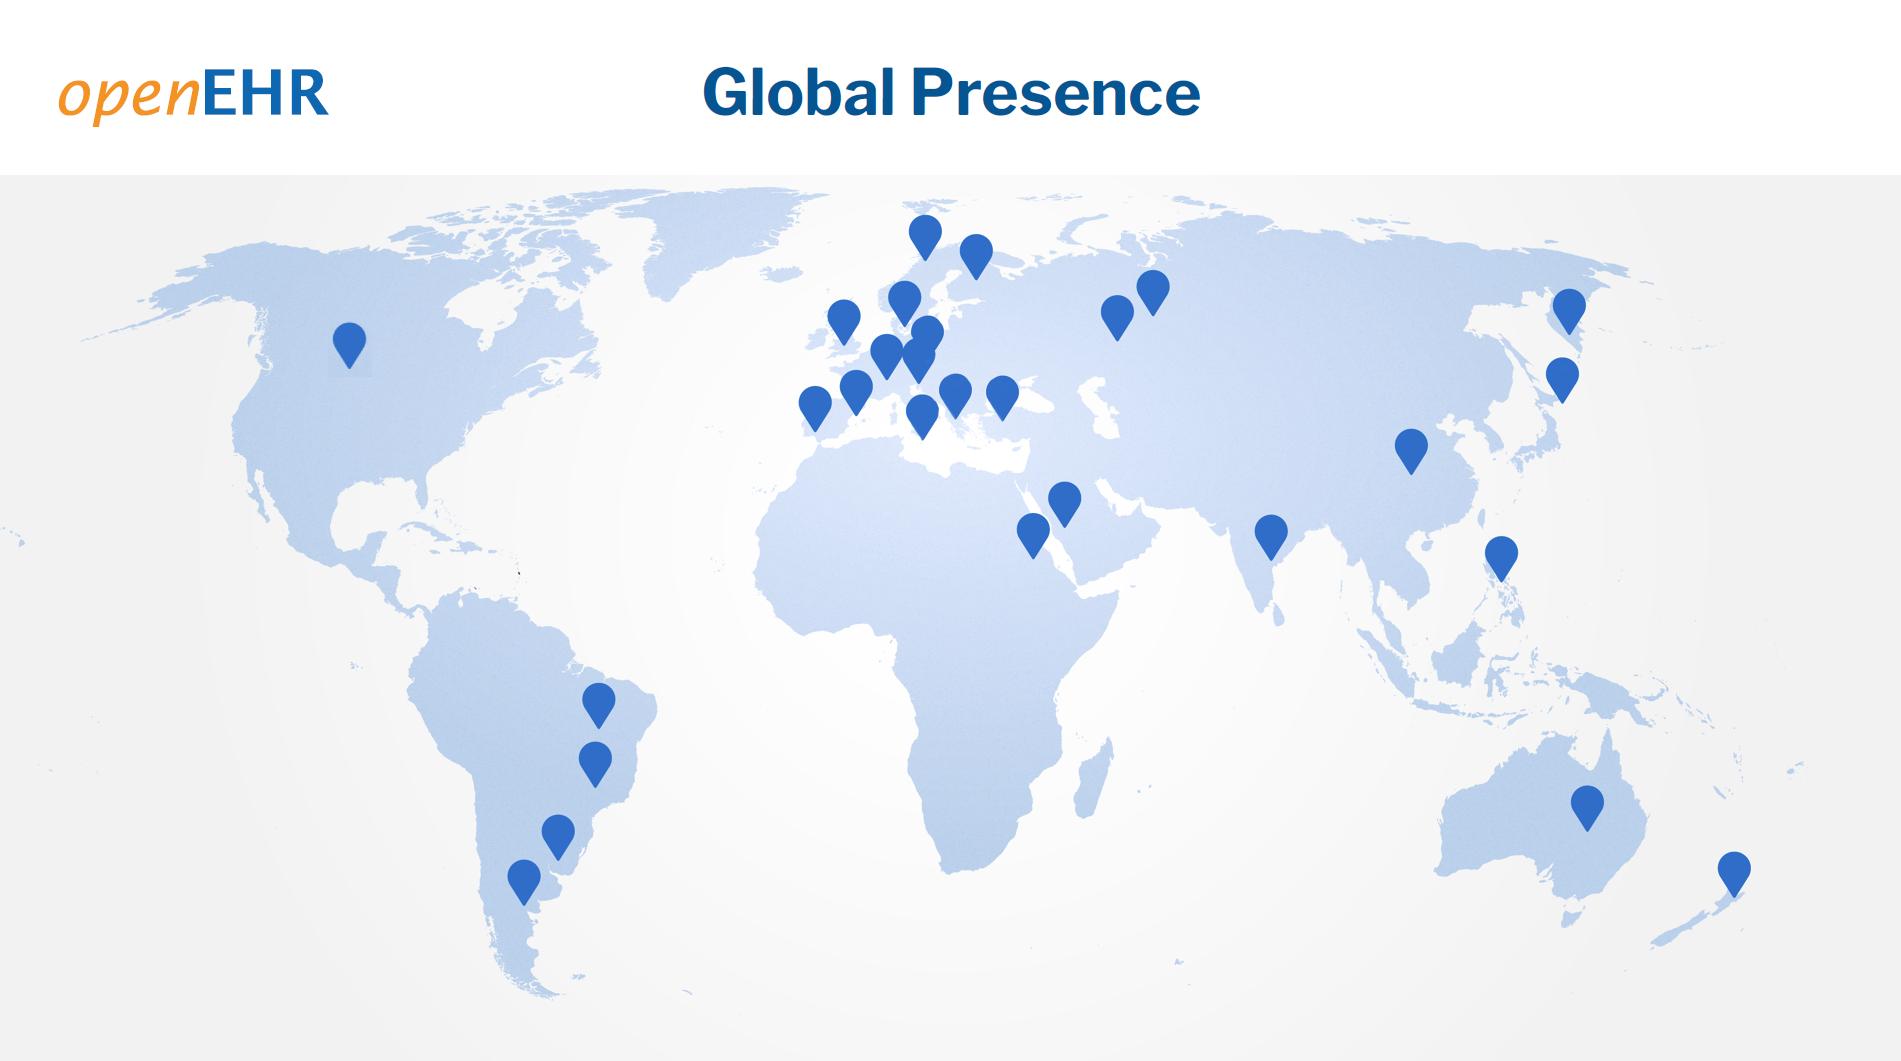 openEHR_global